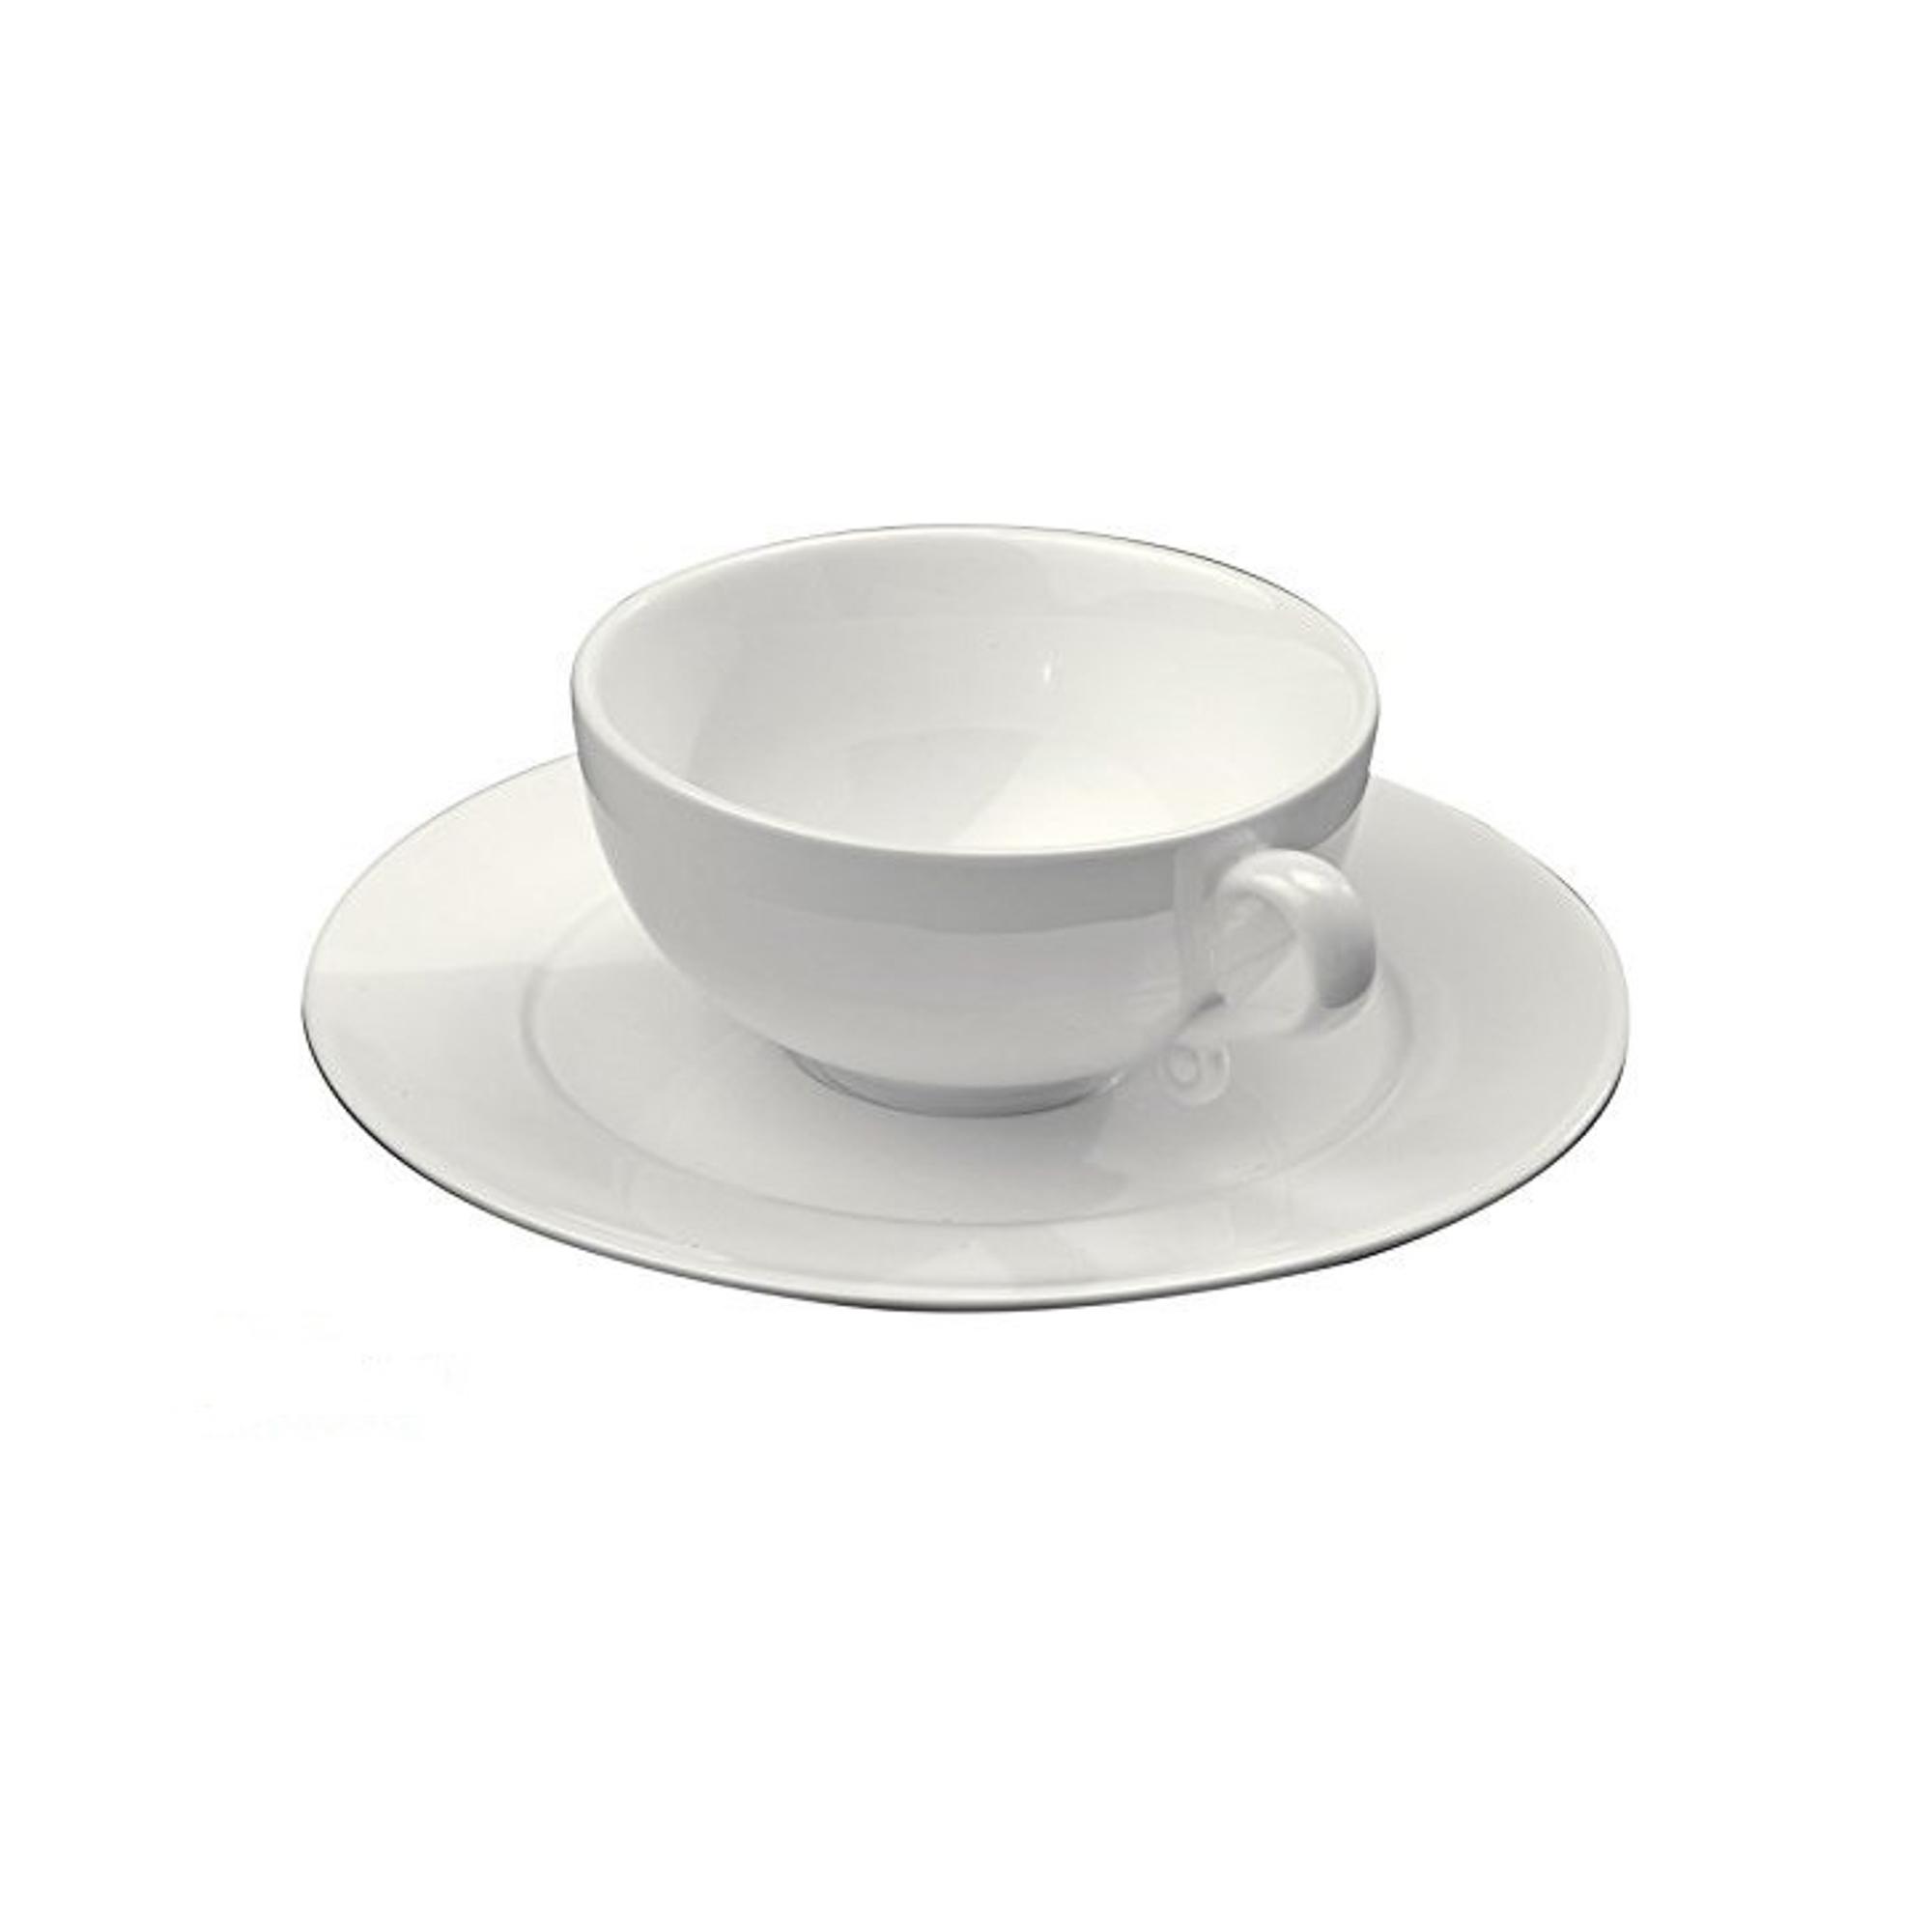 Набор чайный Deagourmet Trame 2 чашки/ 2 блюдца (163)